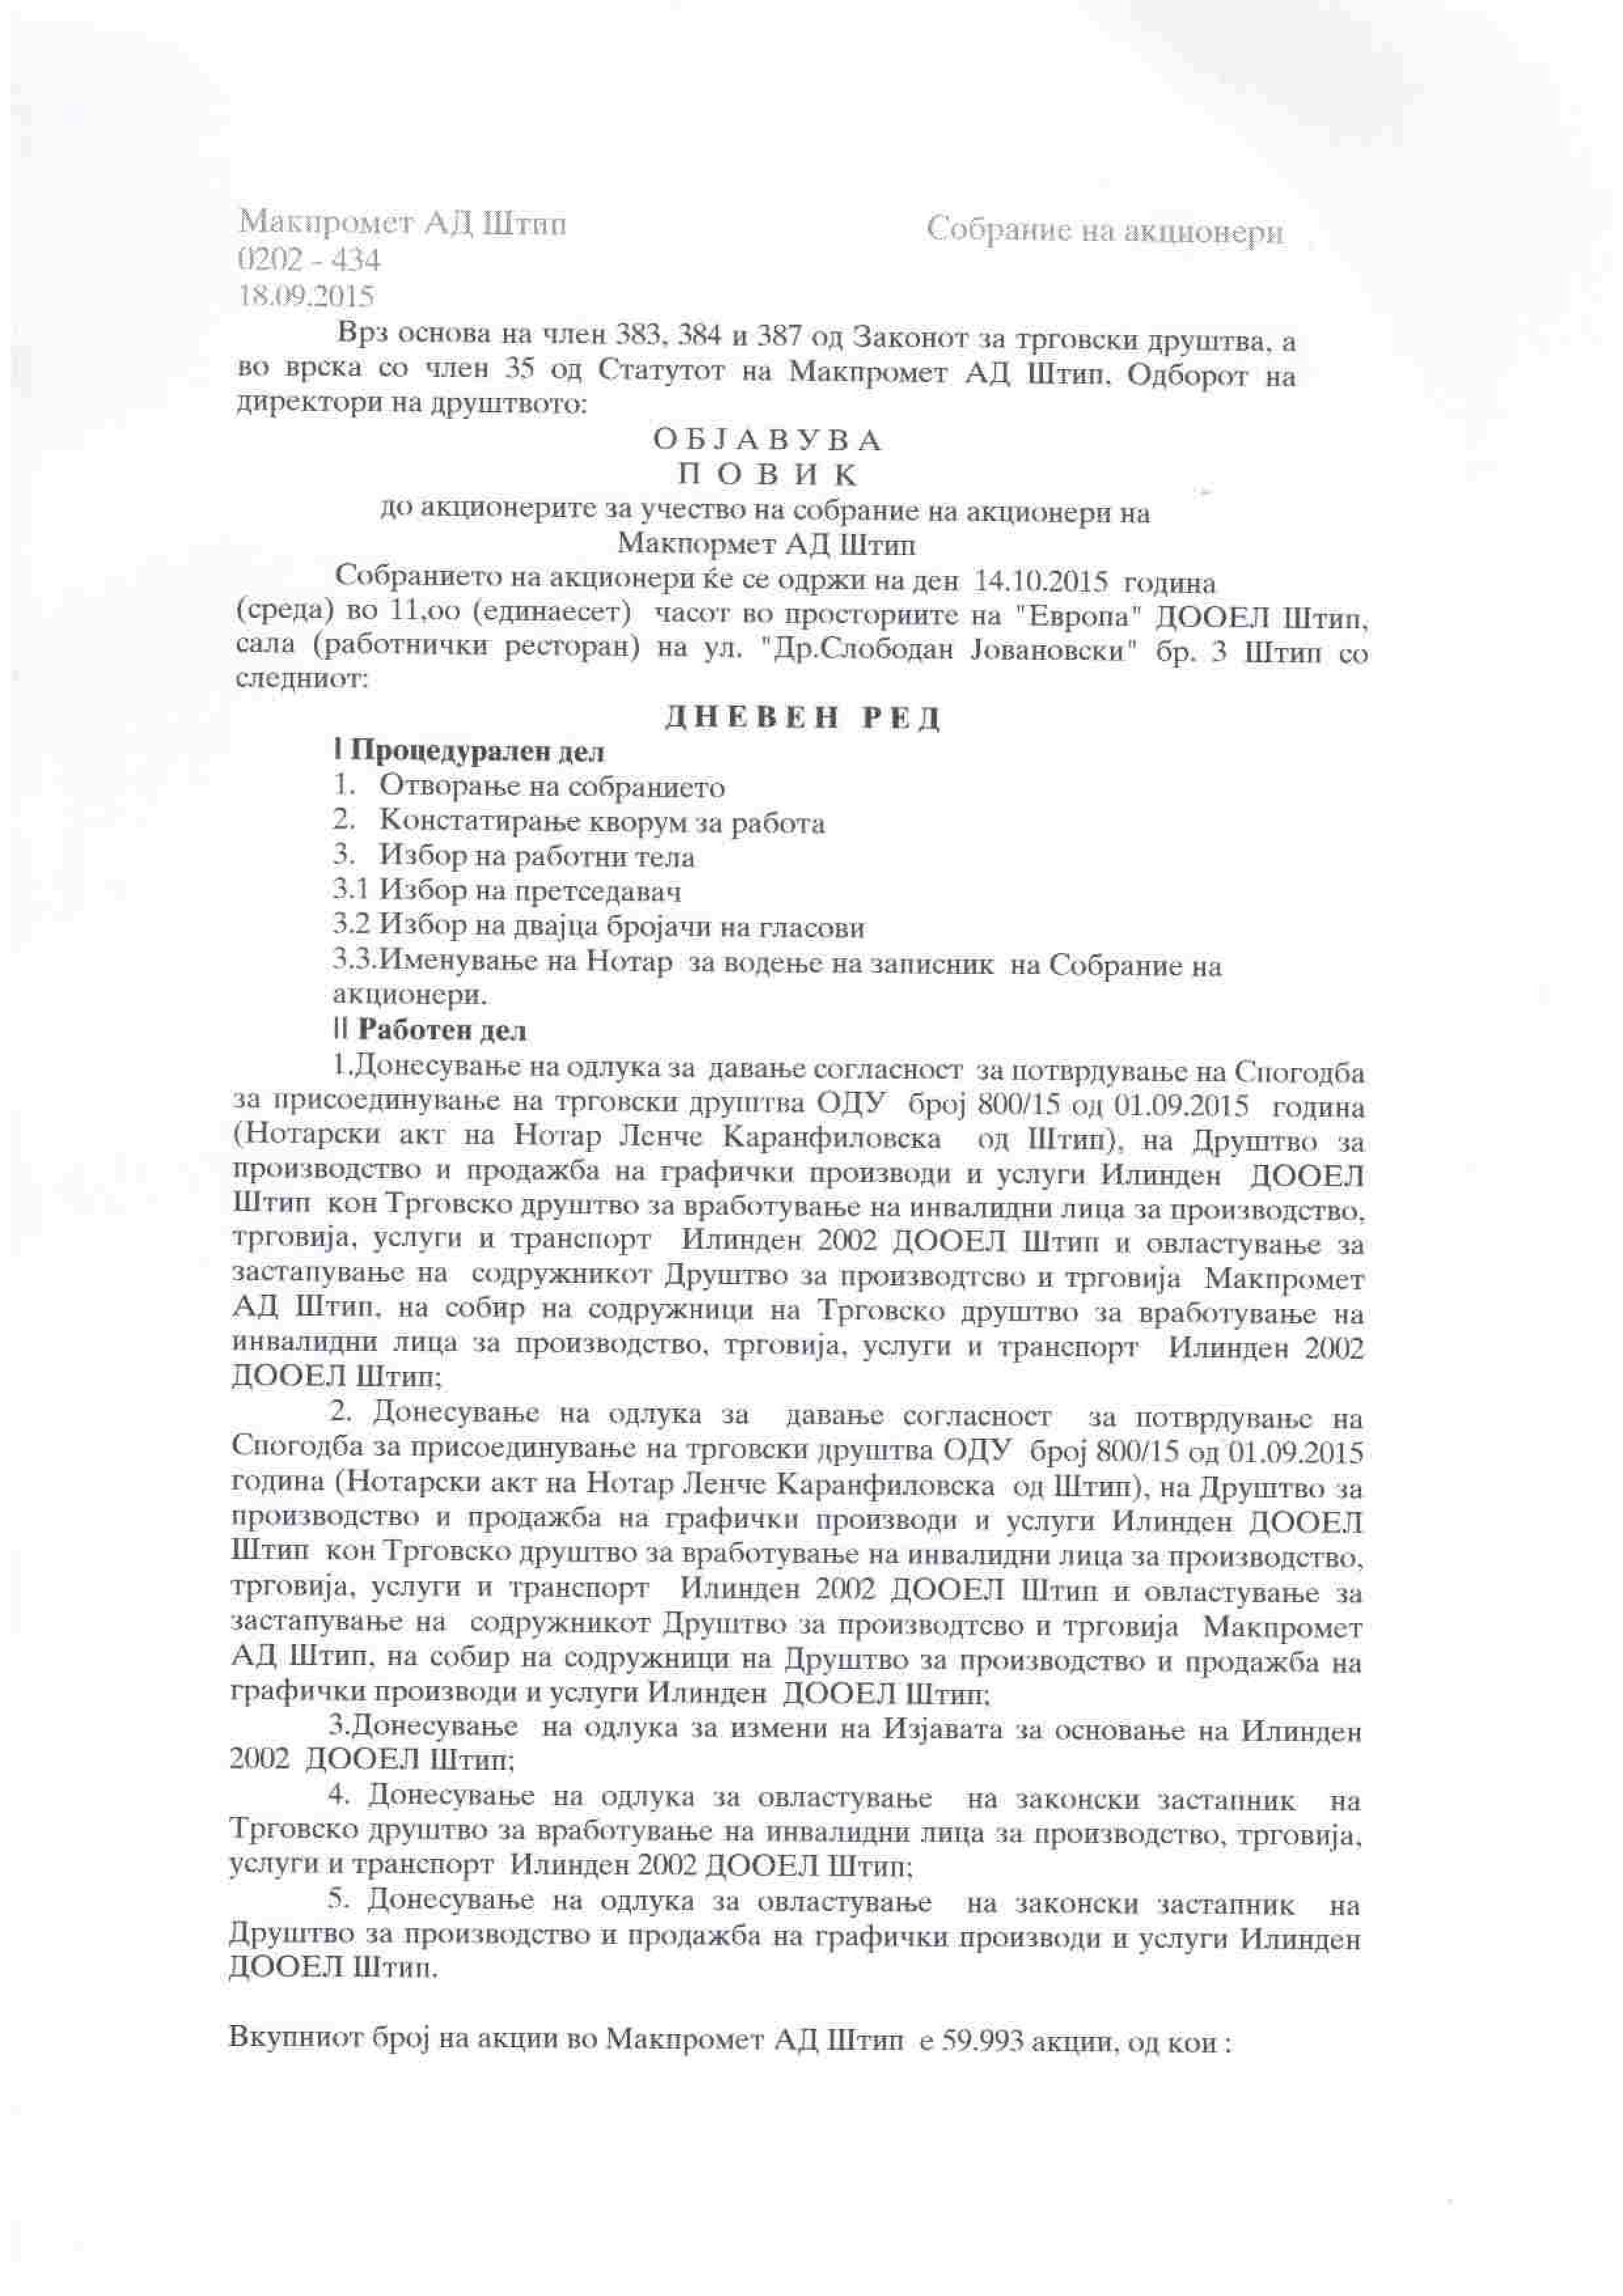 Povik za sobranie na akcioneri 14.10.15